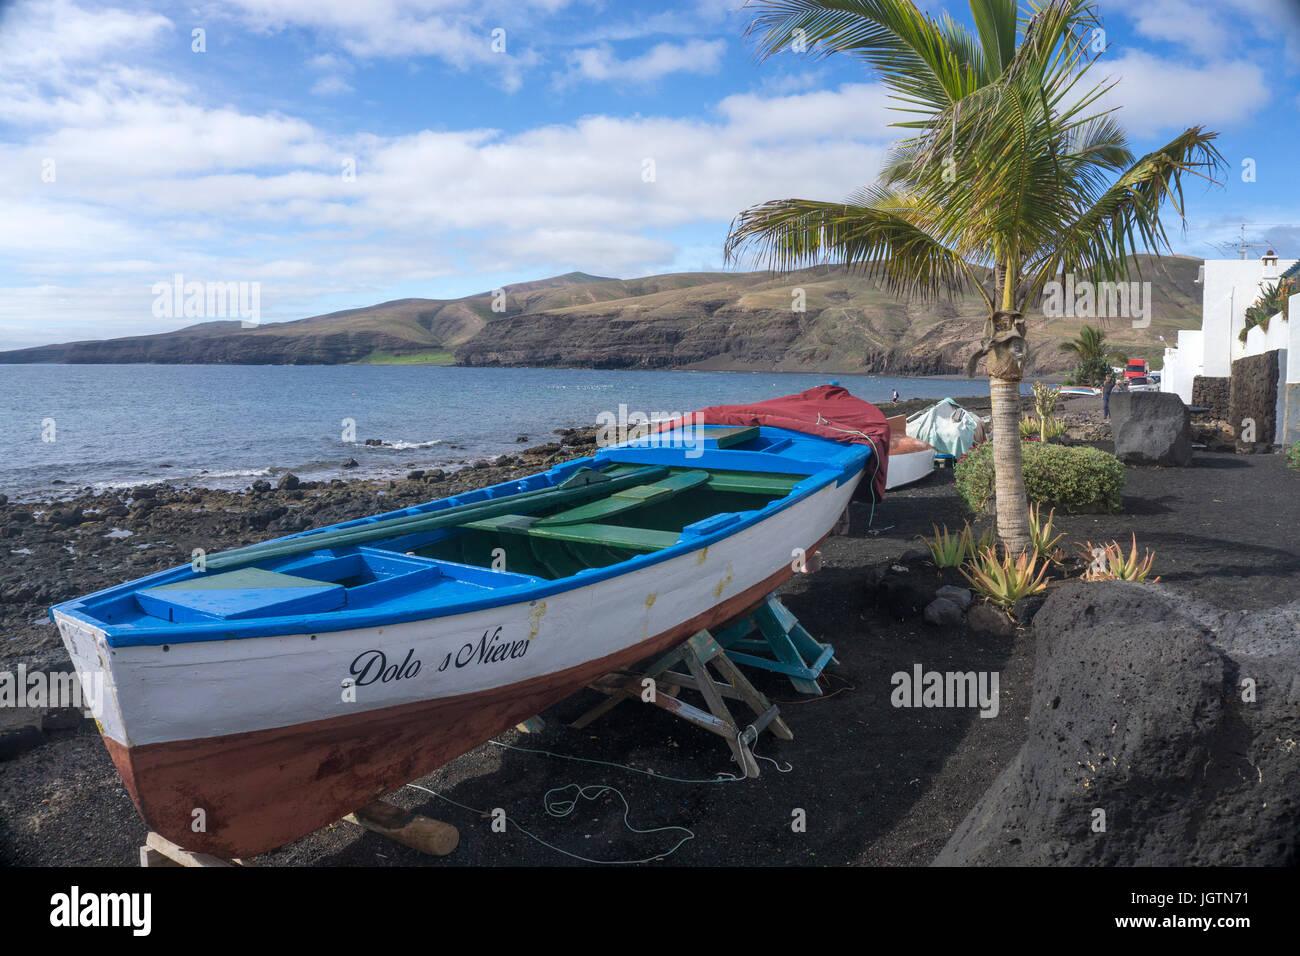 Fishing boats at the beach of the fishing village Playa Quemada, Lanzarote island, Canary islands, Spain, Europe Stock Photo